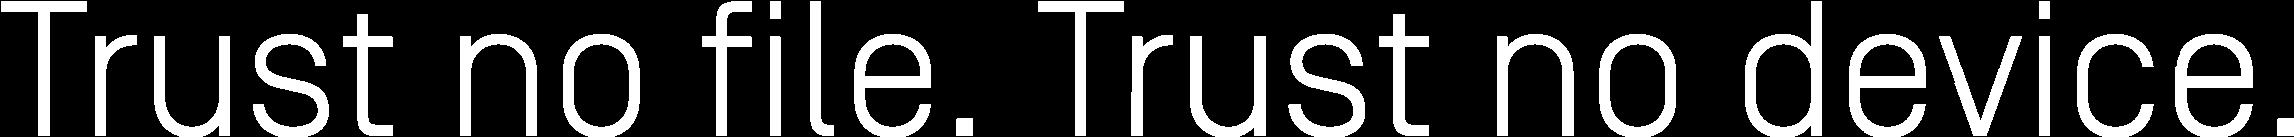 OPSWAT headline Trust no file. Trust no device.